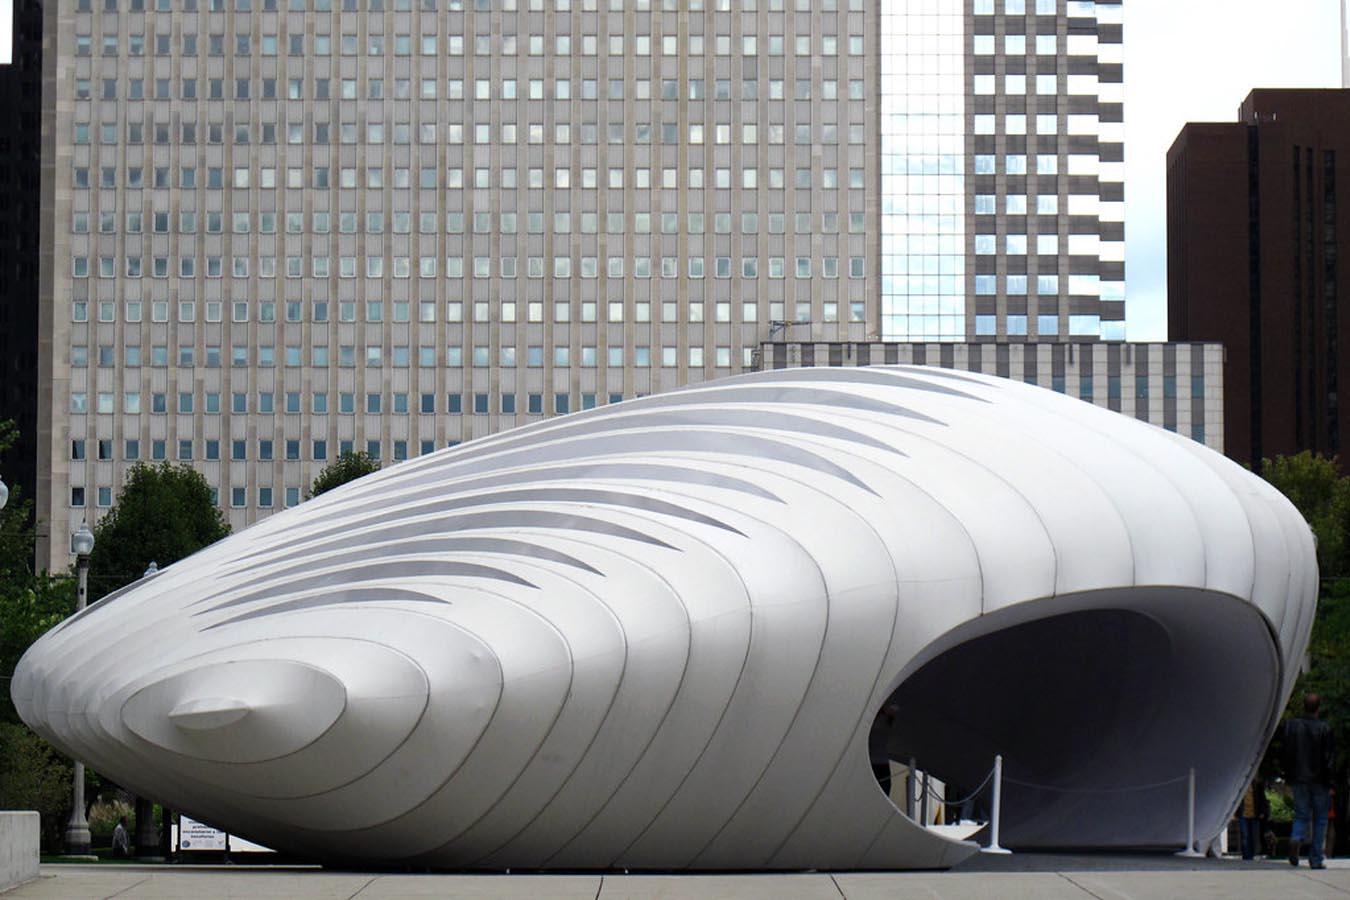 The Burnham Pavilion, China